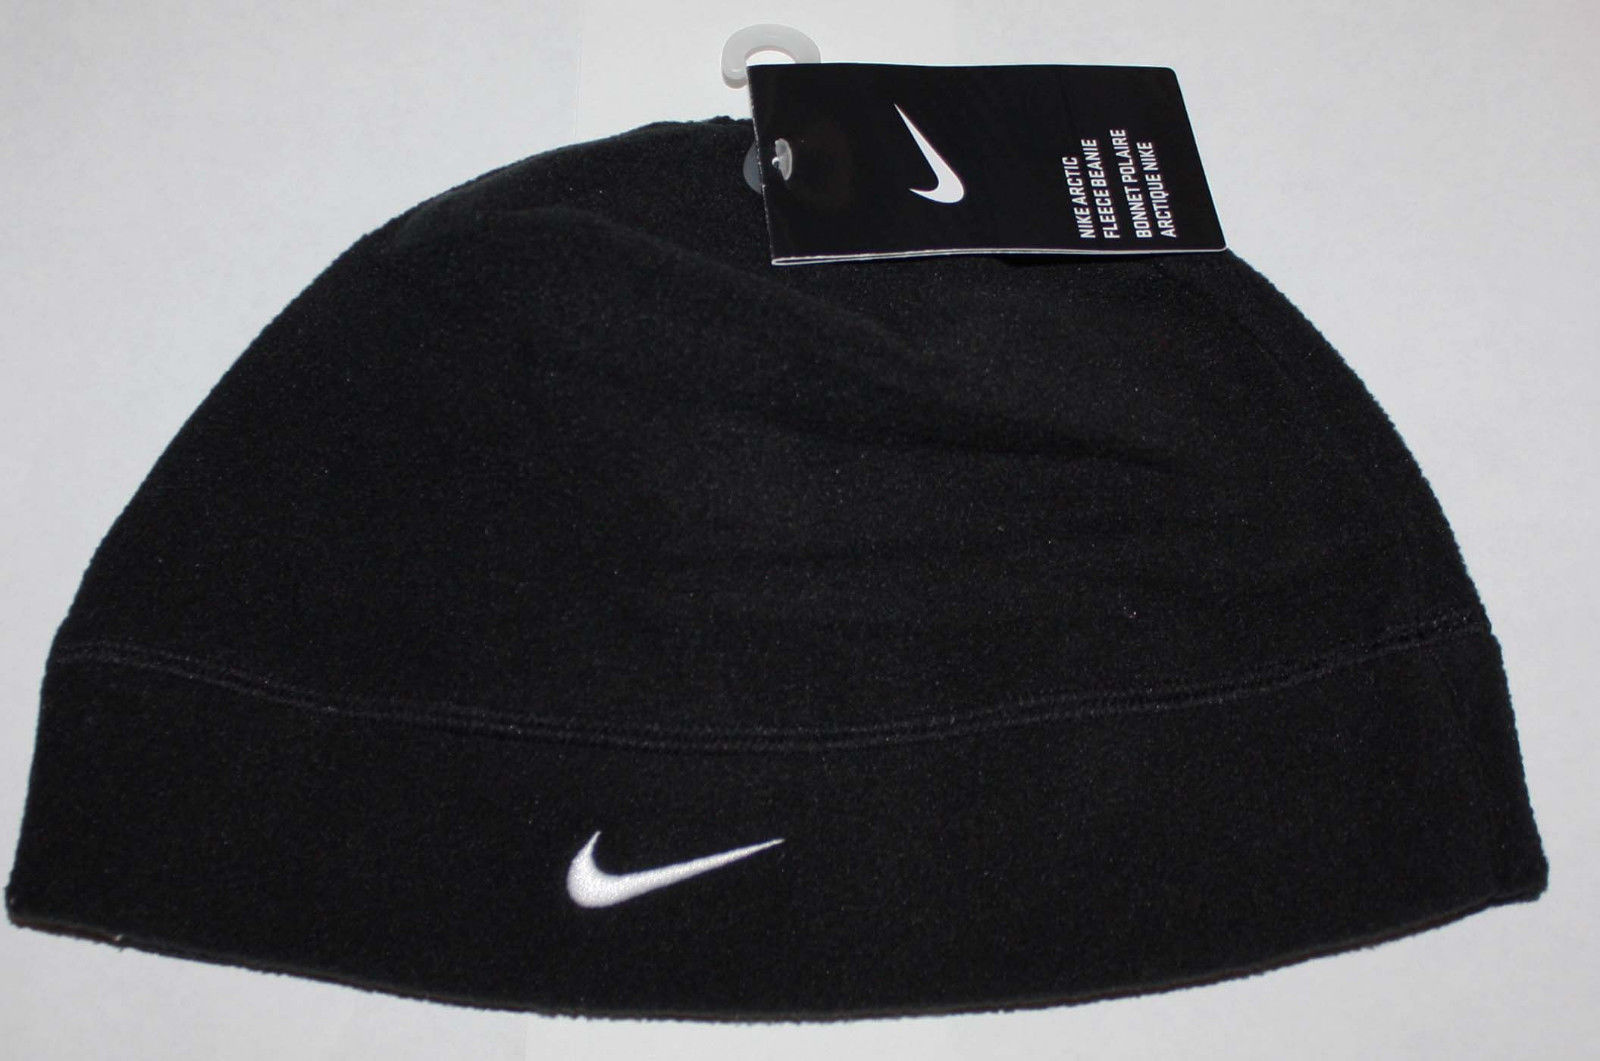 52a2937b766 Nike Arctic Adult Unisex Fleece Beanie Hat- Black (One Size) 11703